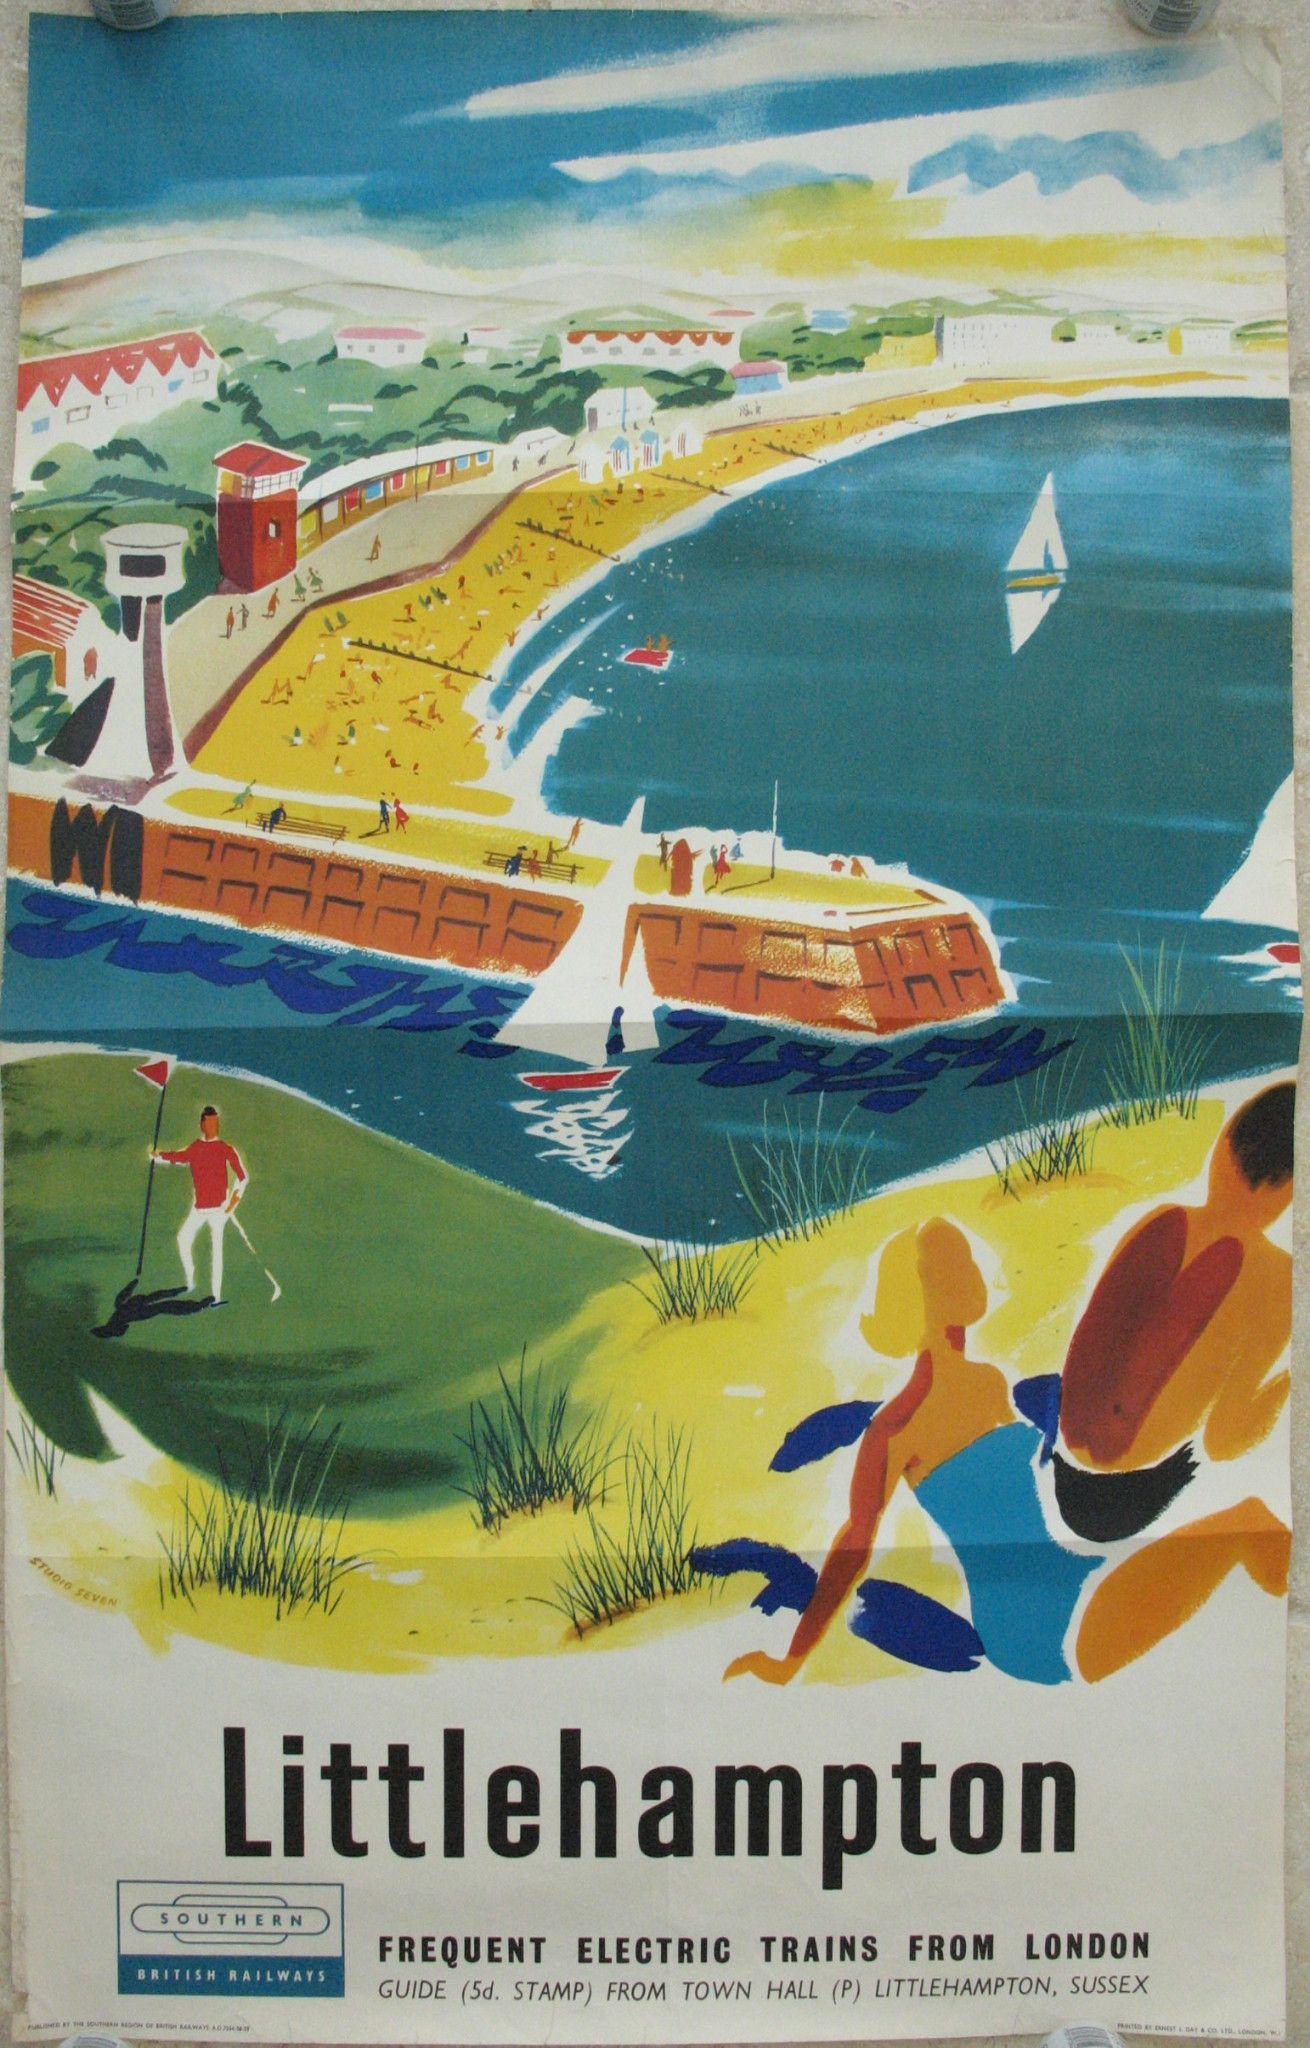 A4,A3,A2,A1 Vintage Retro Travel Poster LITTLEHAMPTON Home Wall Art Print